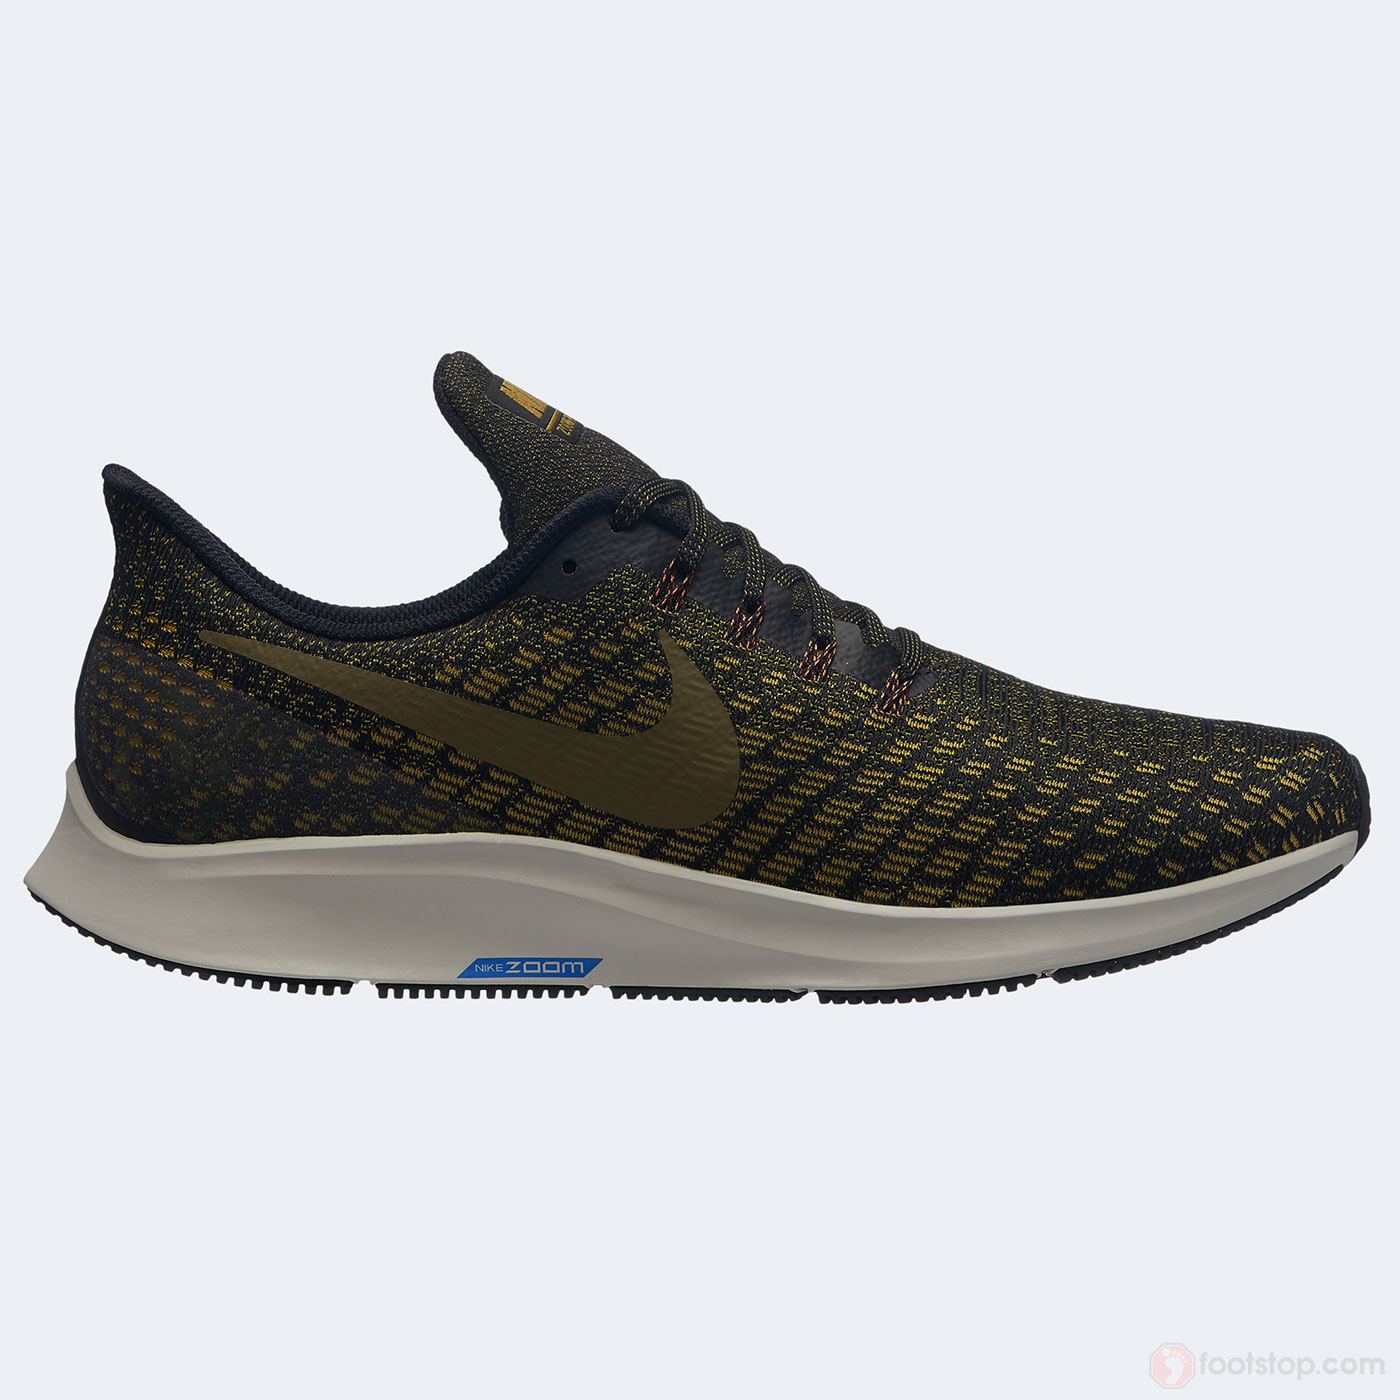 Zapatillas de running Nike AIR ZOOM PEGASUS 35 942851 013